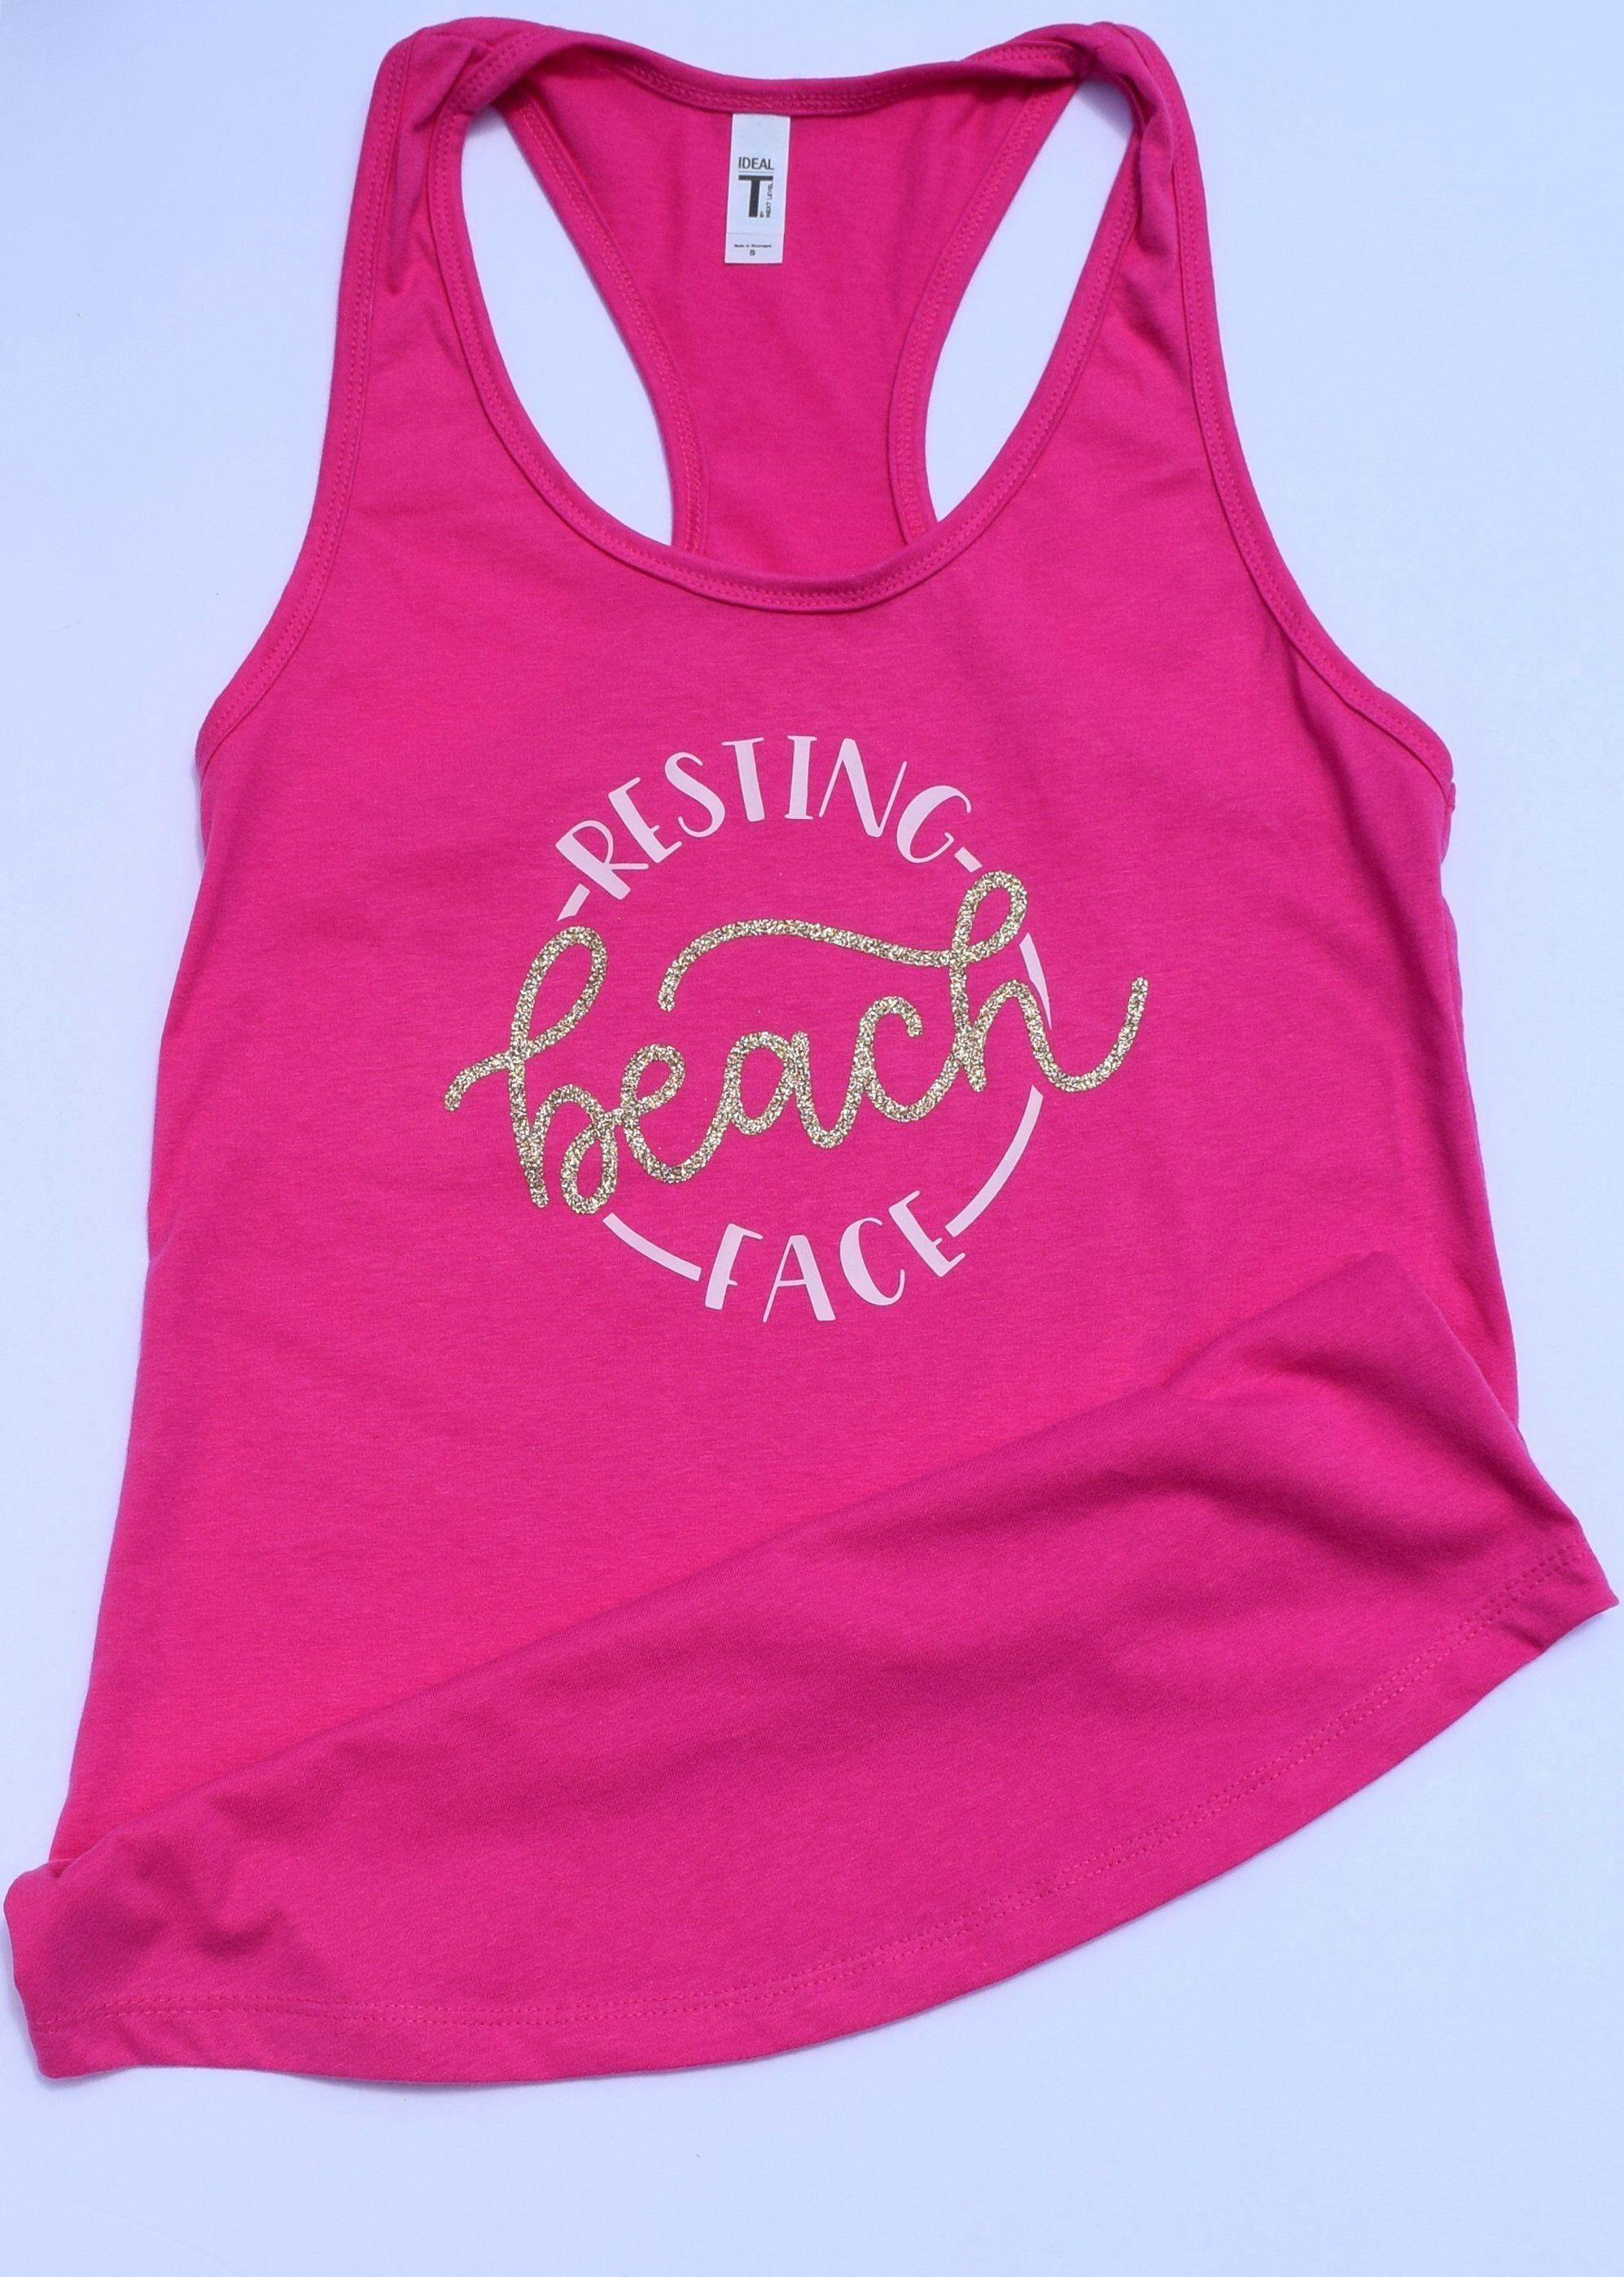 0255ed8f45 Resting Beach Face Women's tank top/ Summer vacation/ Hot Pink Racerback  Shirt/ Beach wear/ Bachelorette Party/ Group Vacation Shirts #women  #tanktops ...